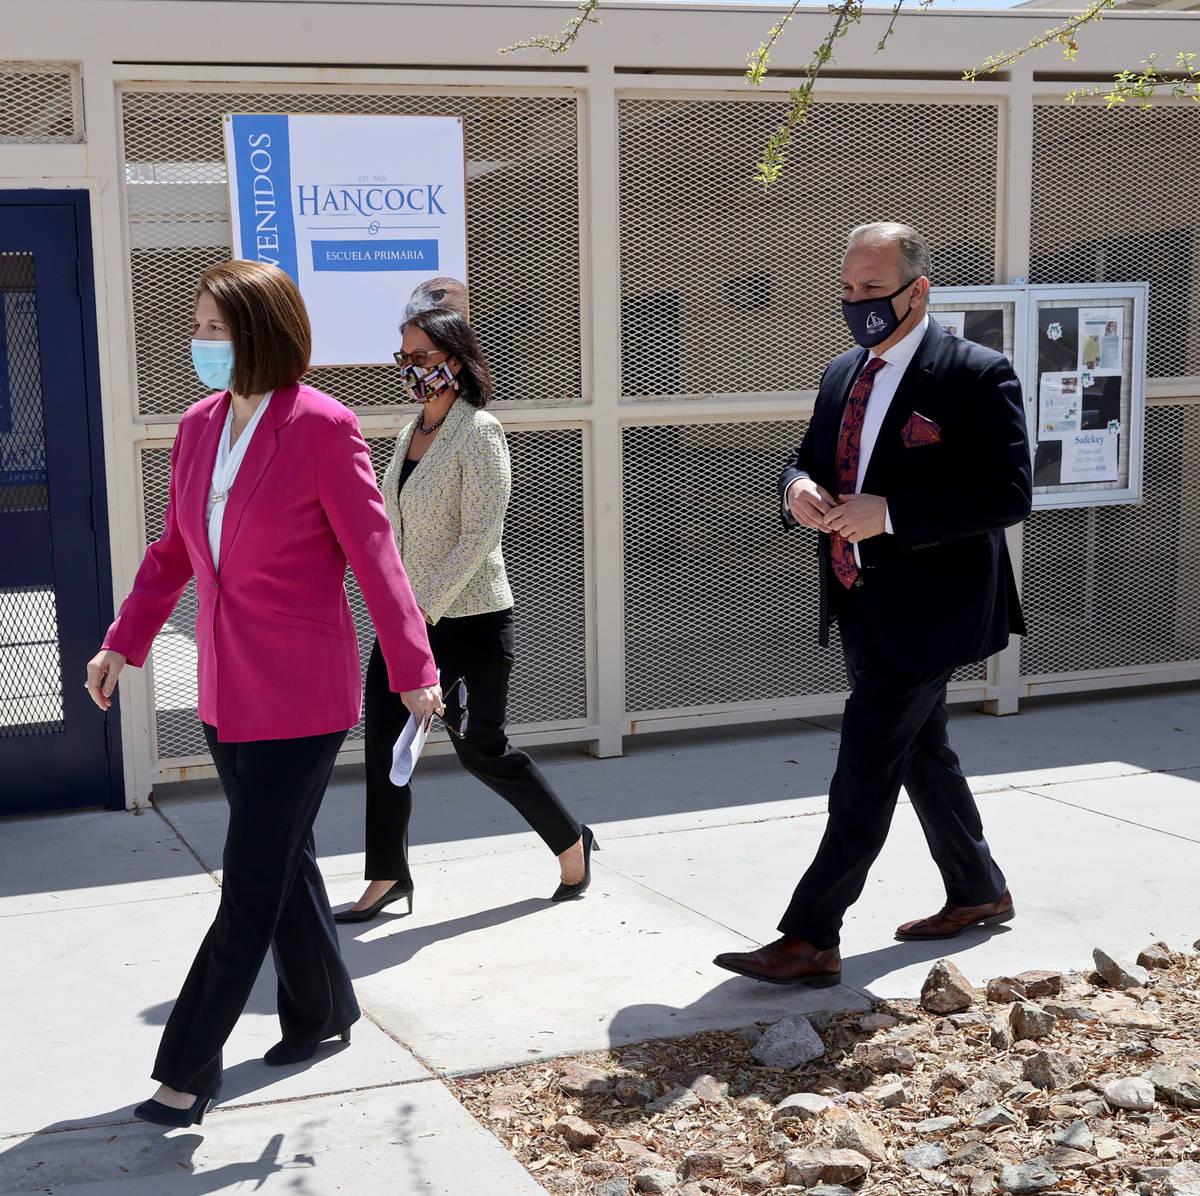 Sen. Catherine Cortez Masto, D-Nev., left, visits Hancock Elementary in Las Vegas Wednesday, Ap ...